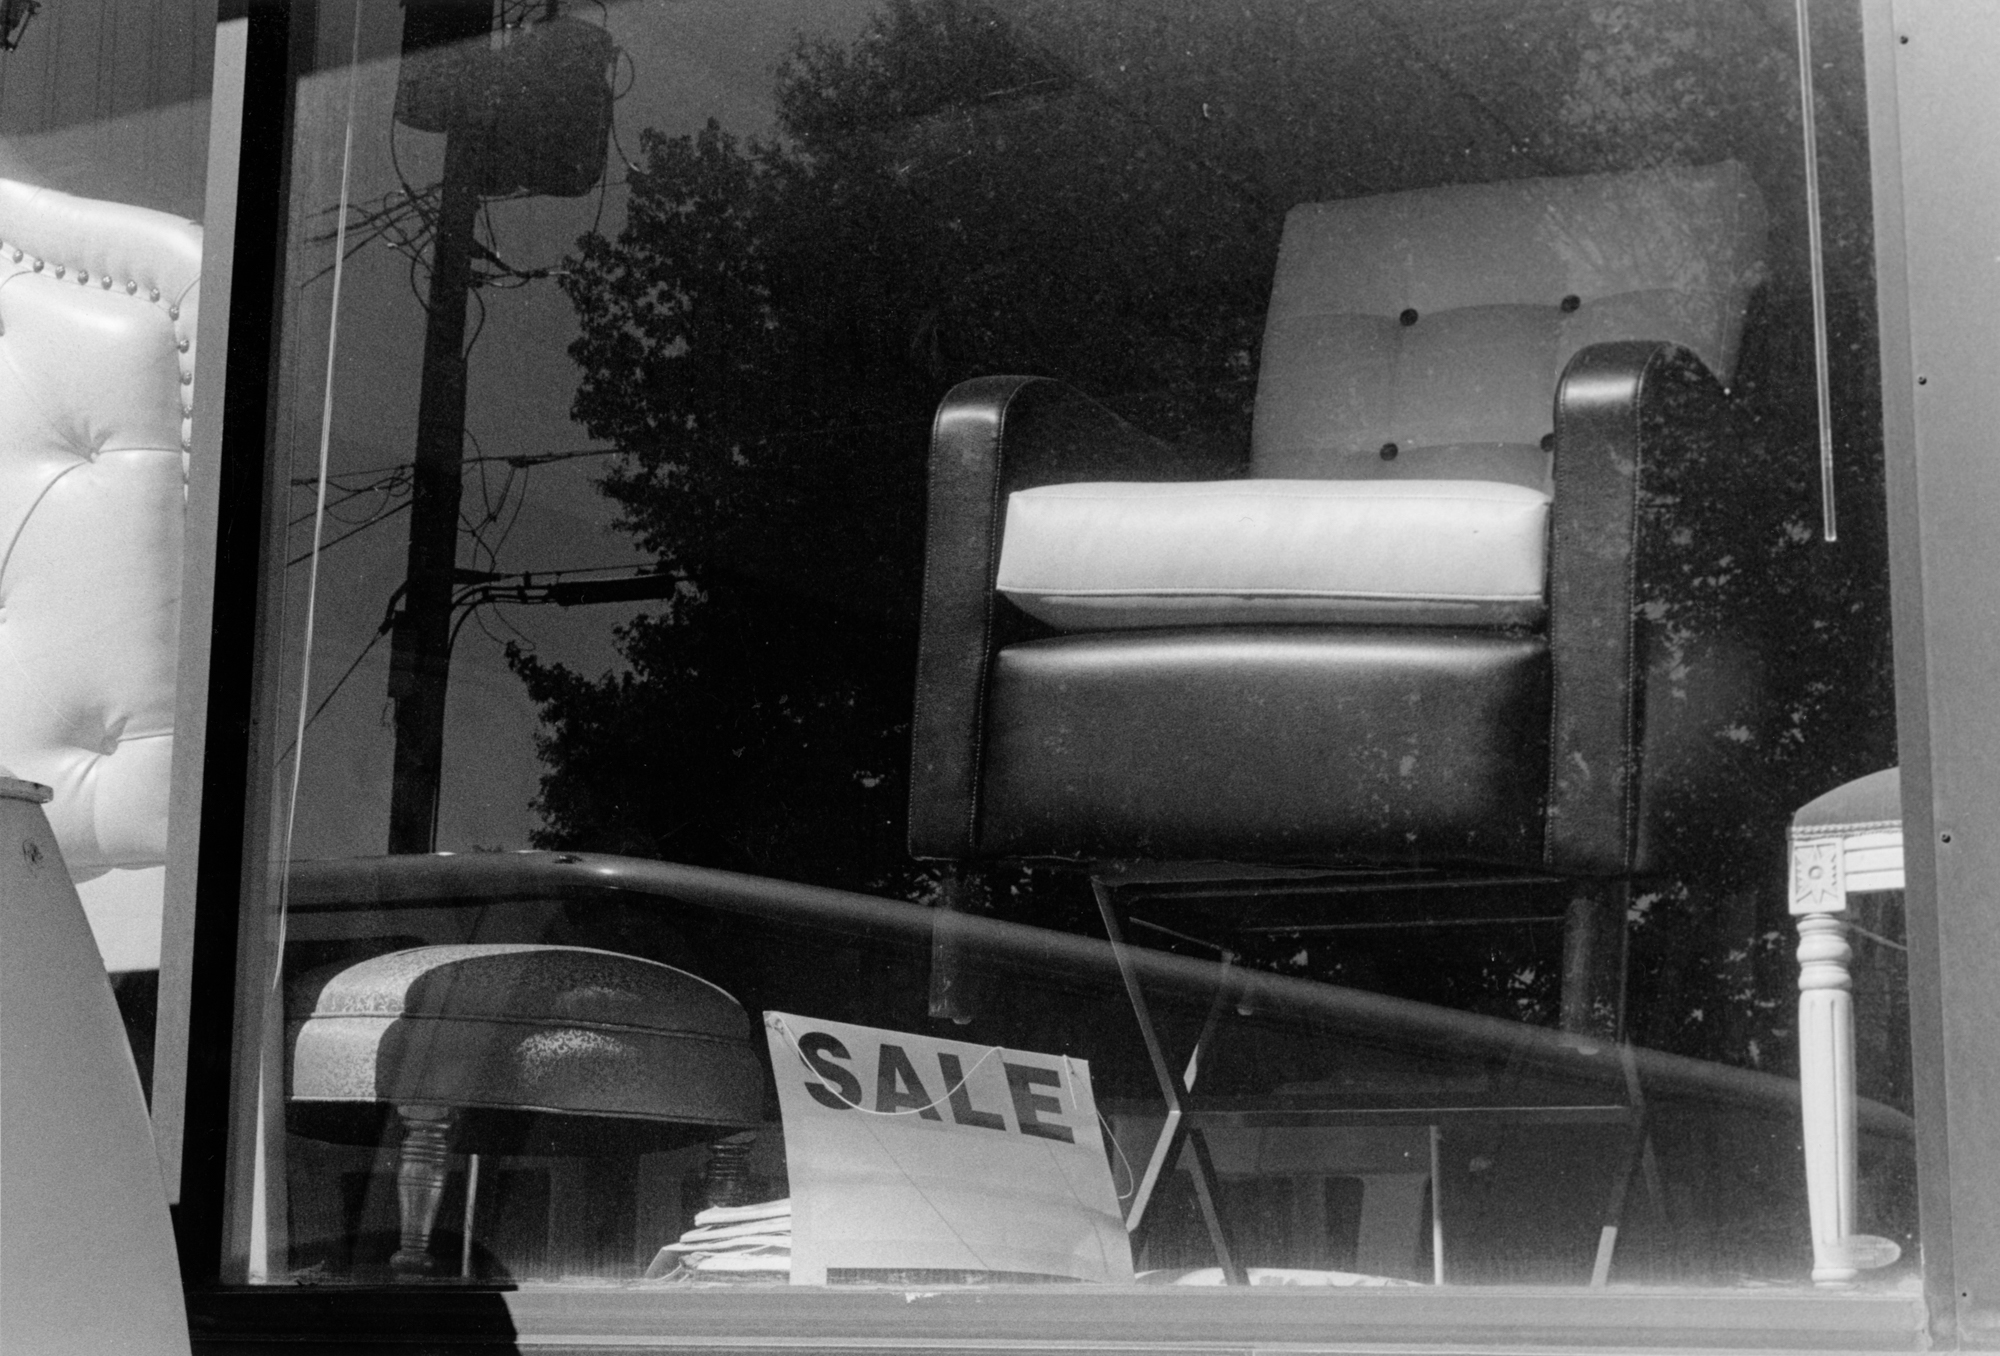 Penelope_Stone-Window_Shopping-2.jpg